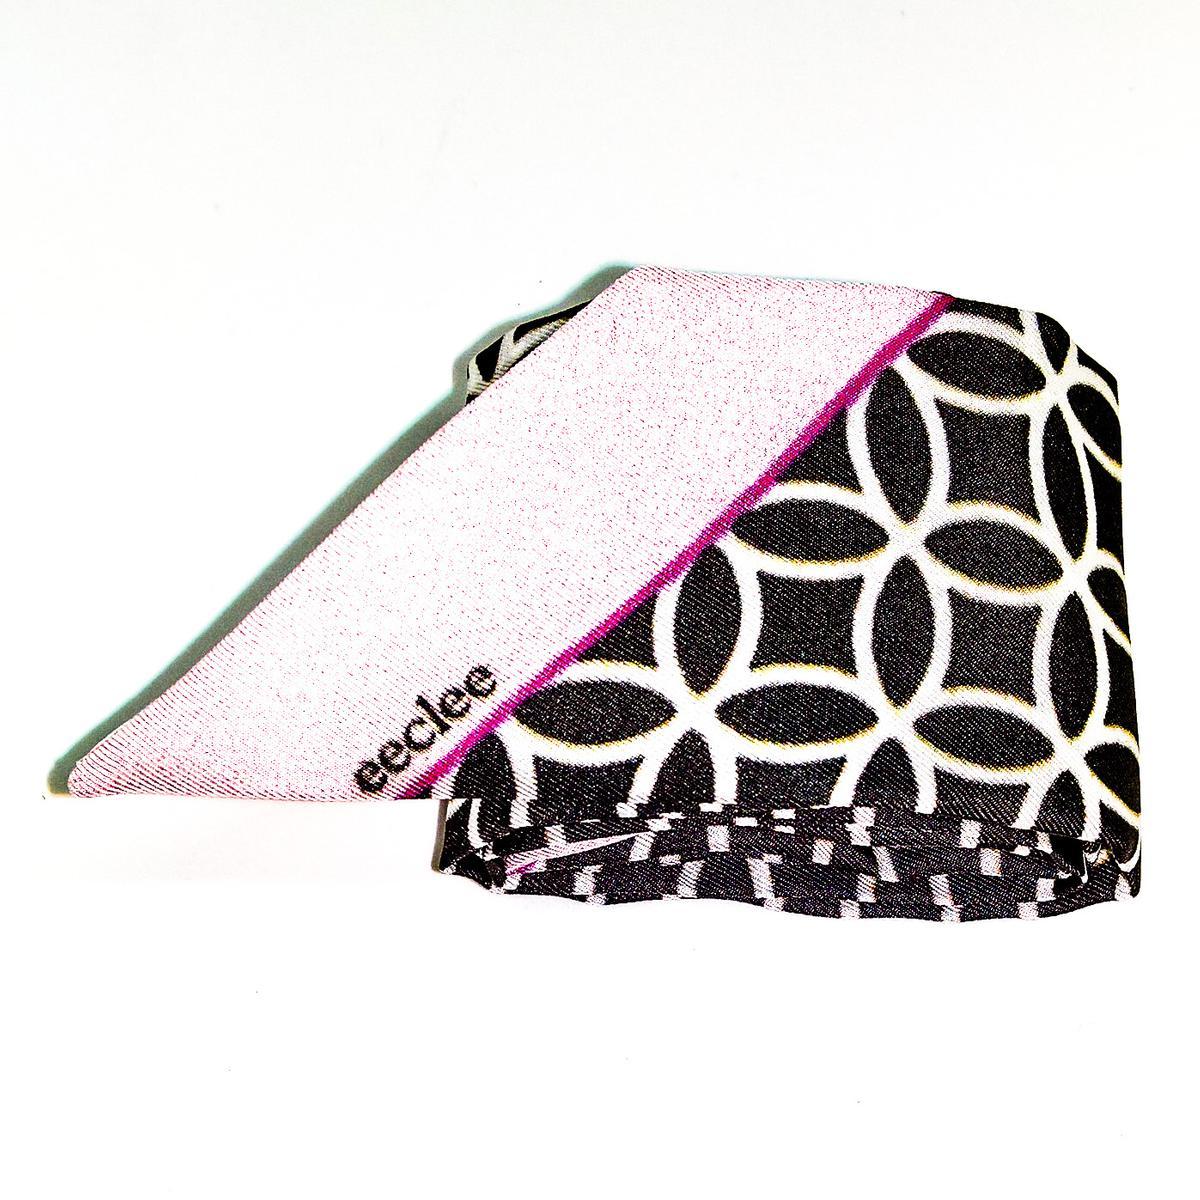 eeclee eeclee estelle ros schwarz wei pink seidenb nder kaufen eeclee. Black Bedroom Furniture Sets. Home Design Ideas